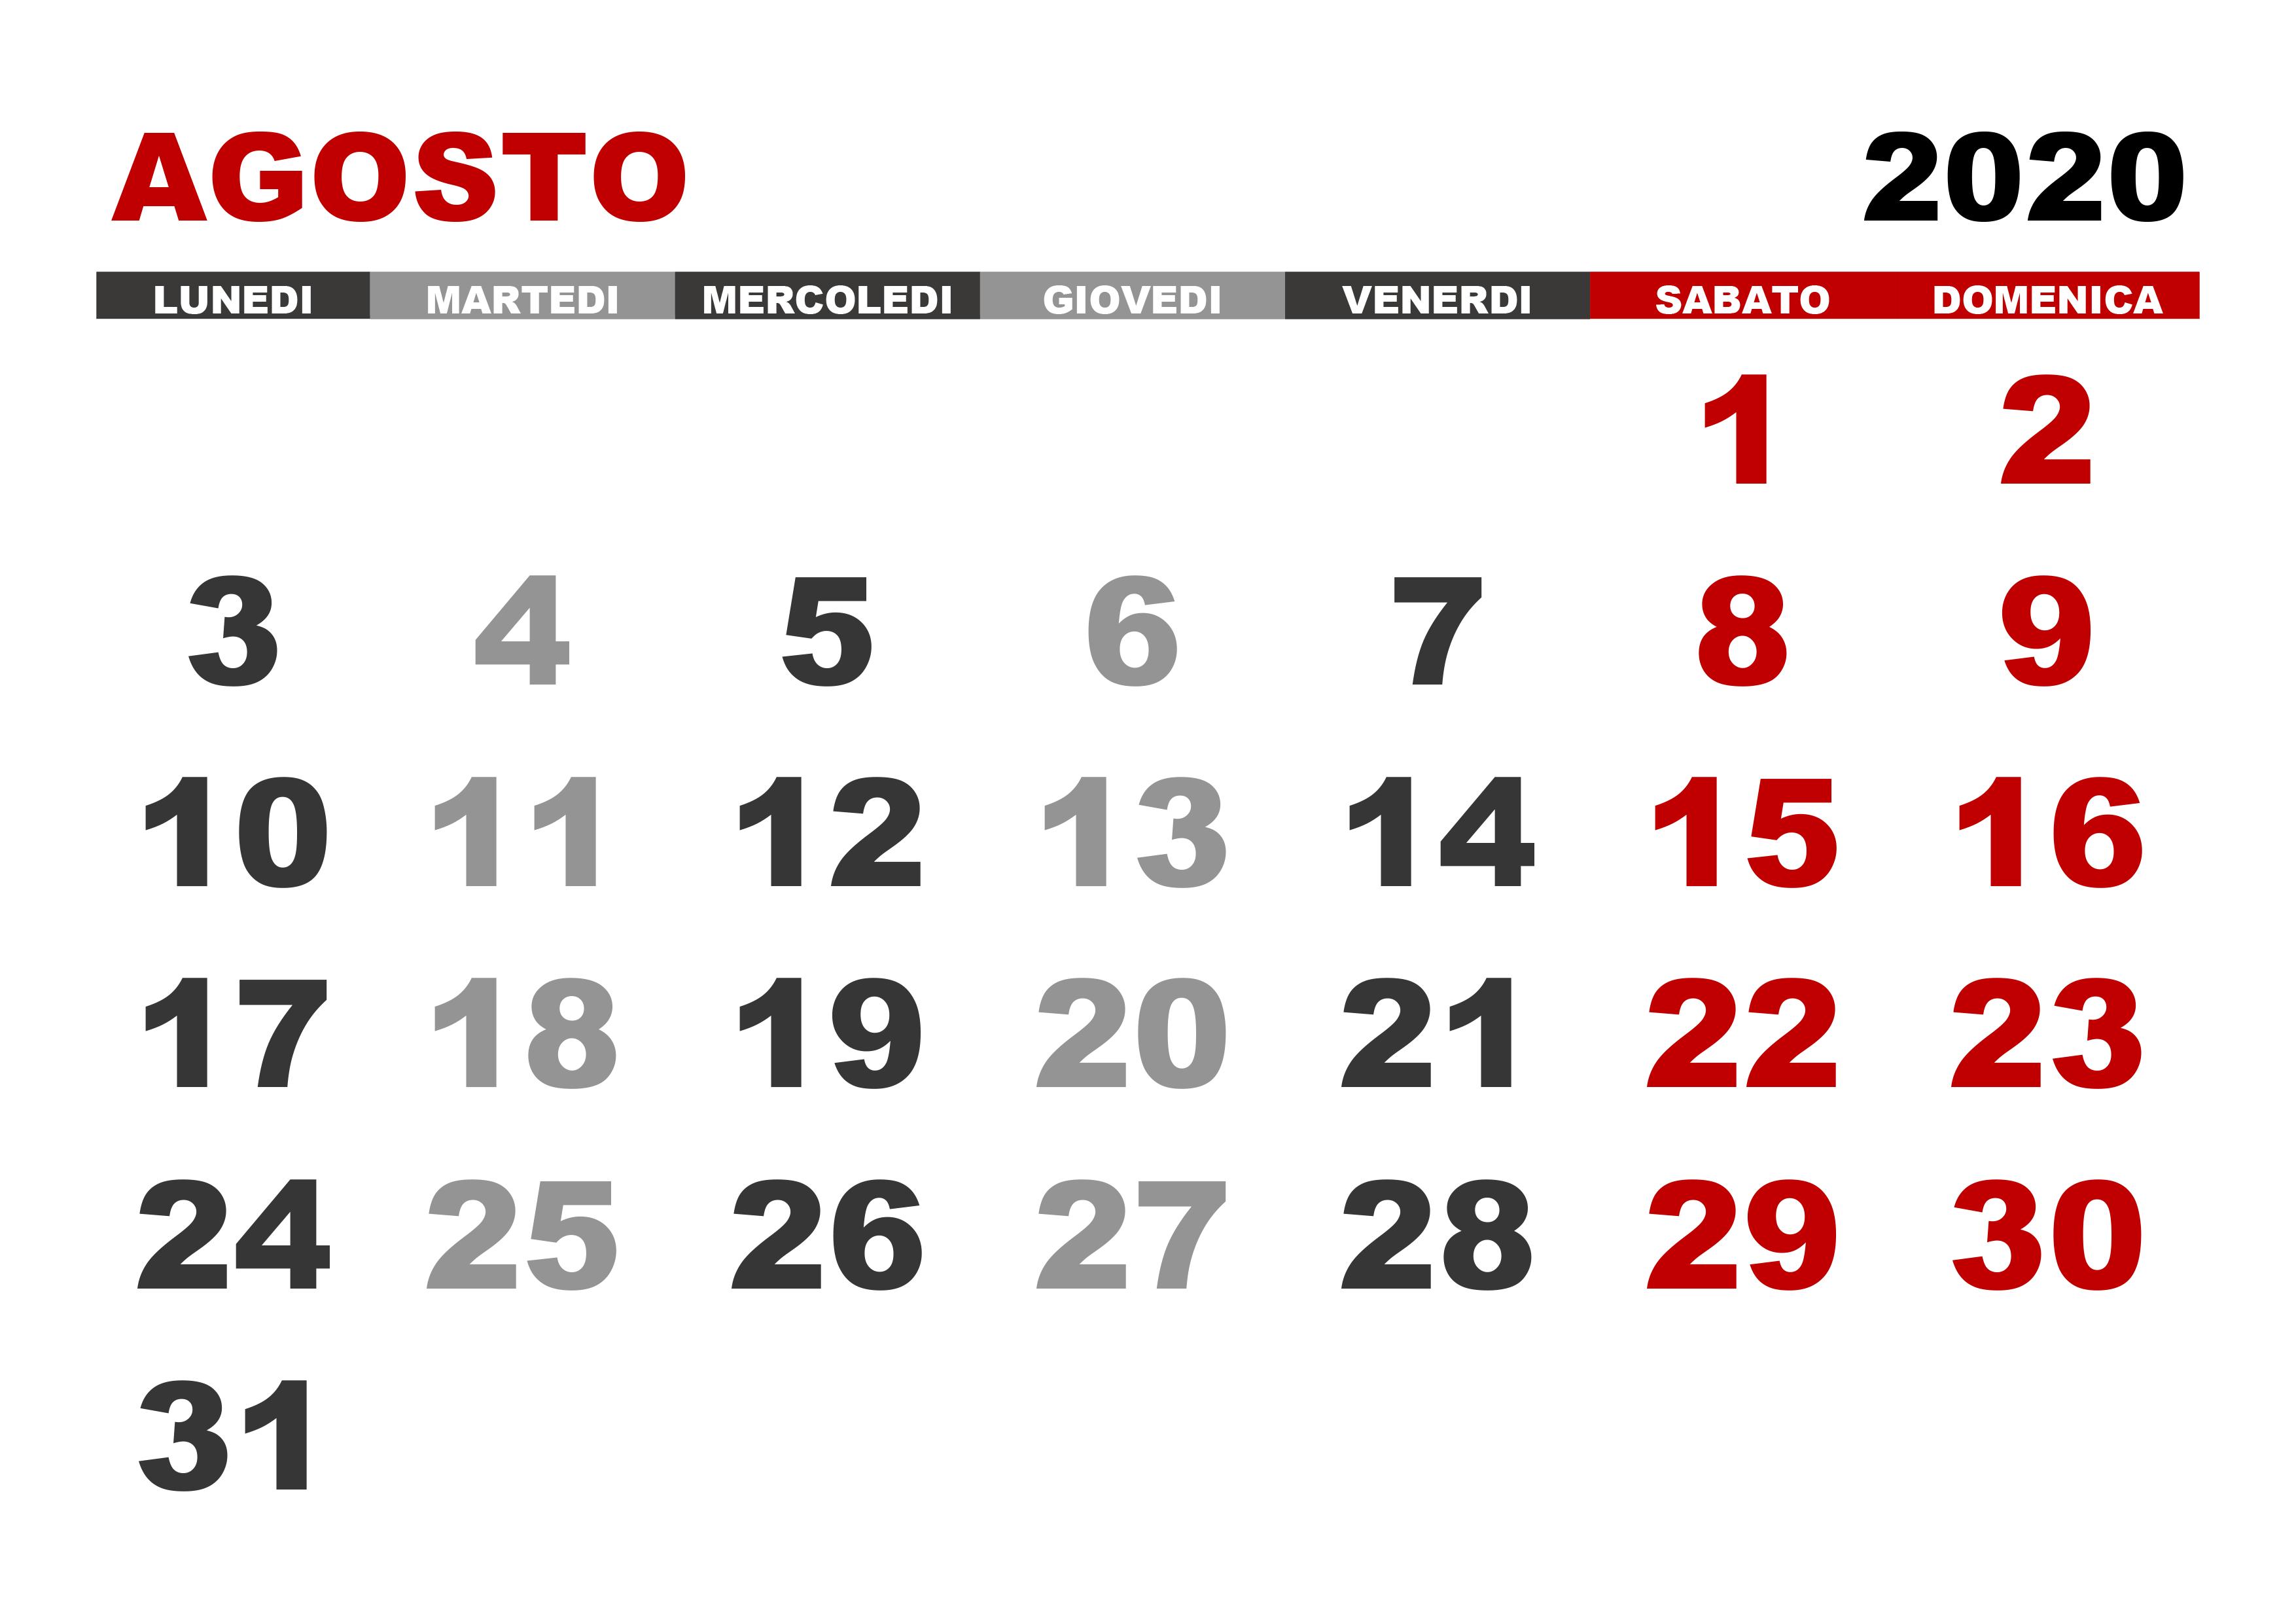 Calendario Luglio Agosto 2020.Calendario Agosto 2020 Calendario Su